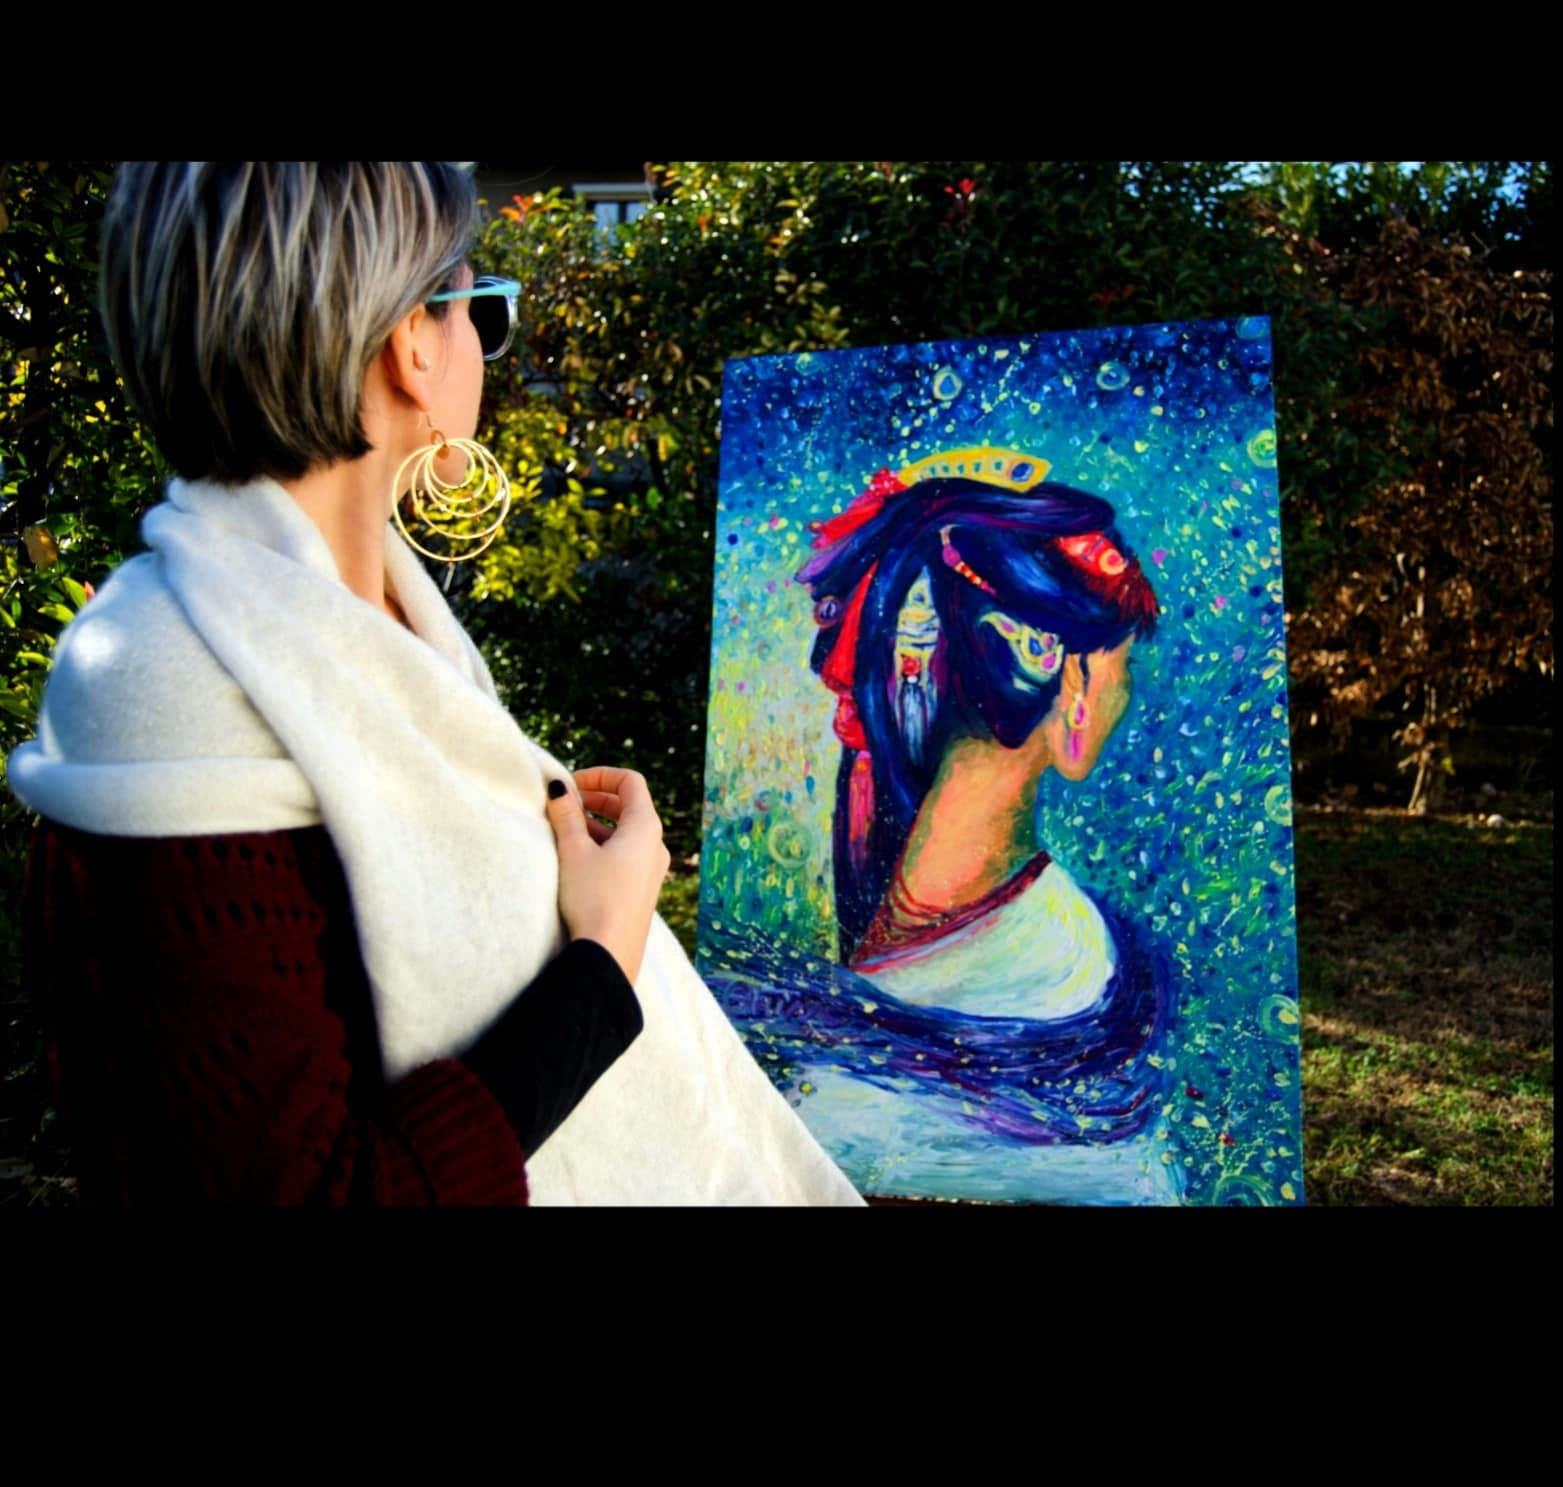 Chiara Magni artist